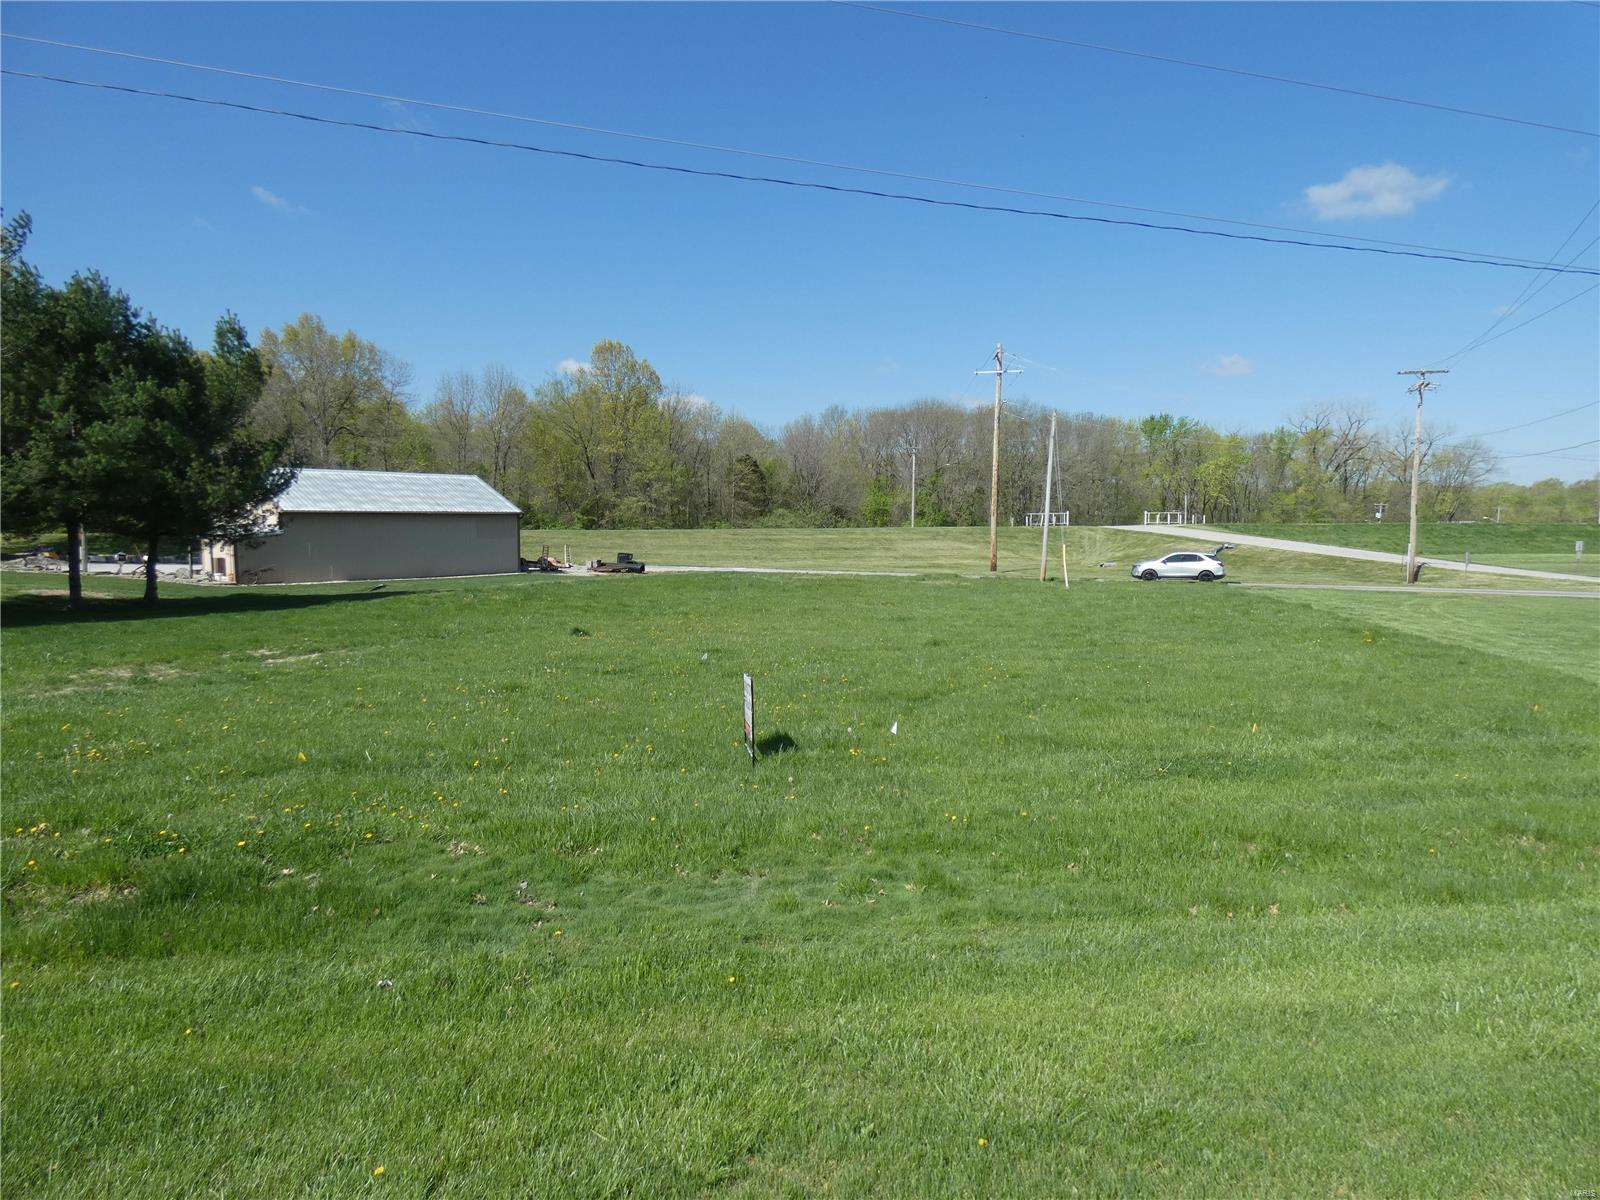 0 Van Buren Property Photo - New Athens, IL real estate listing